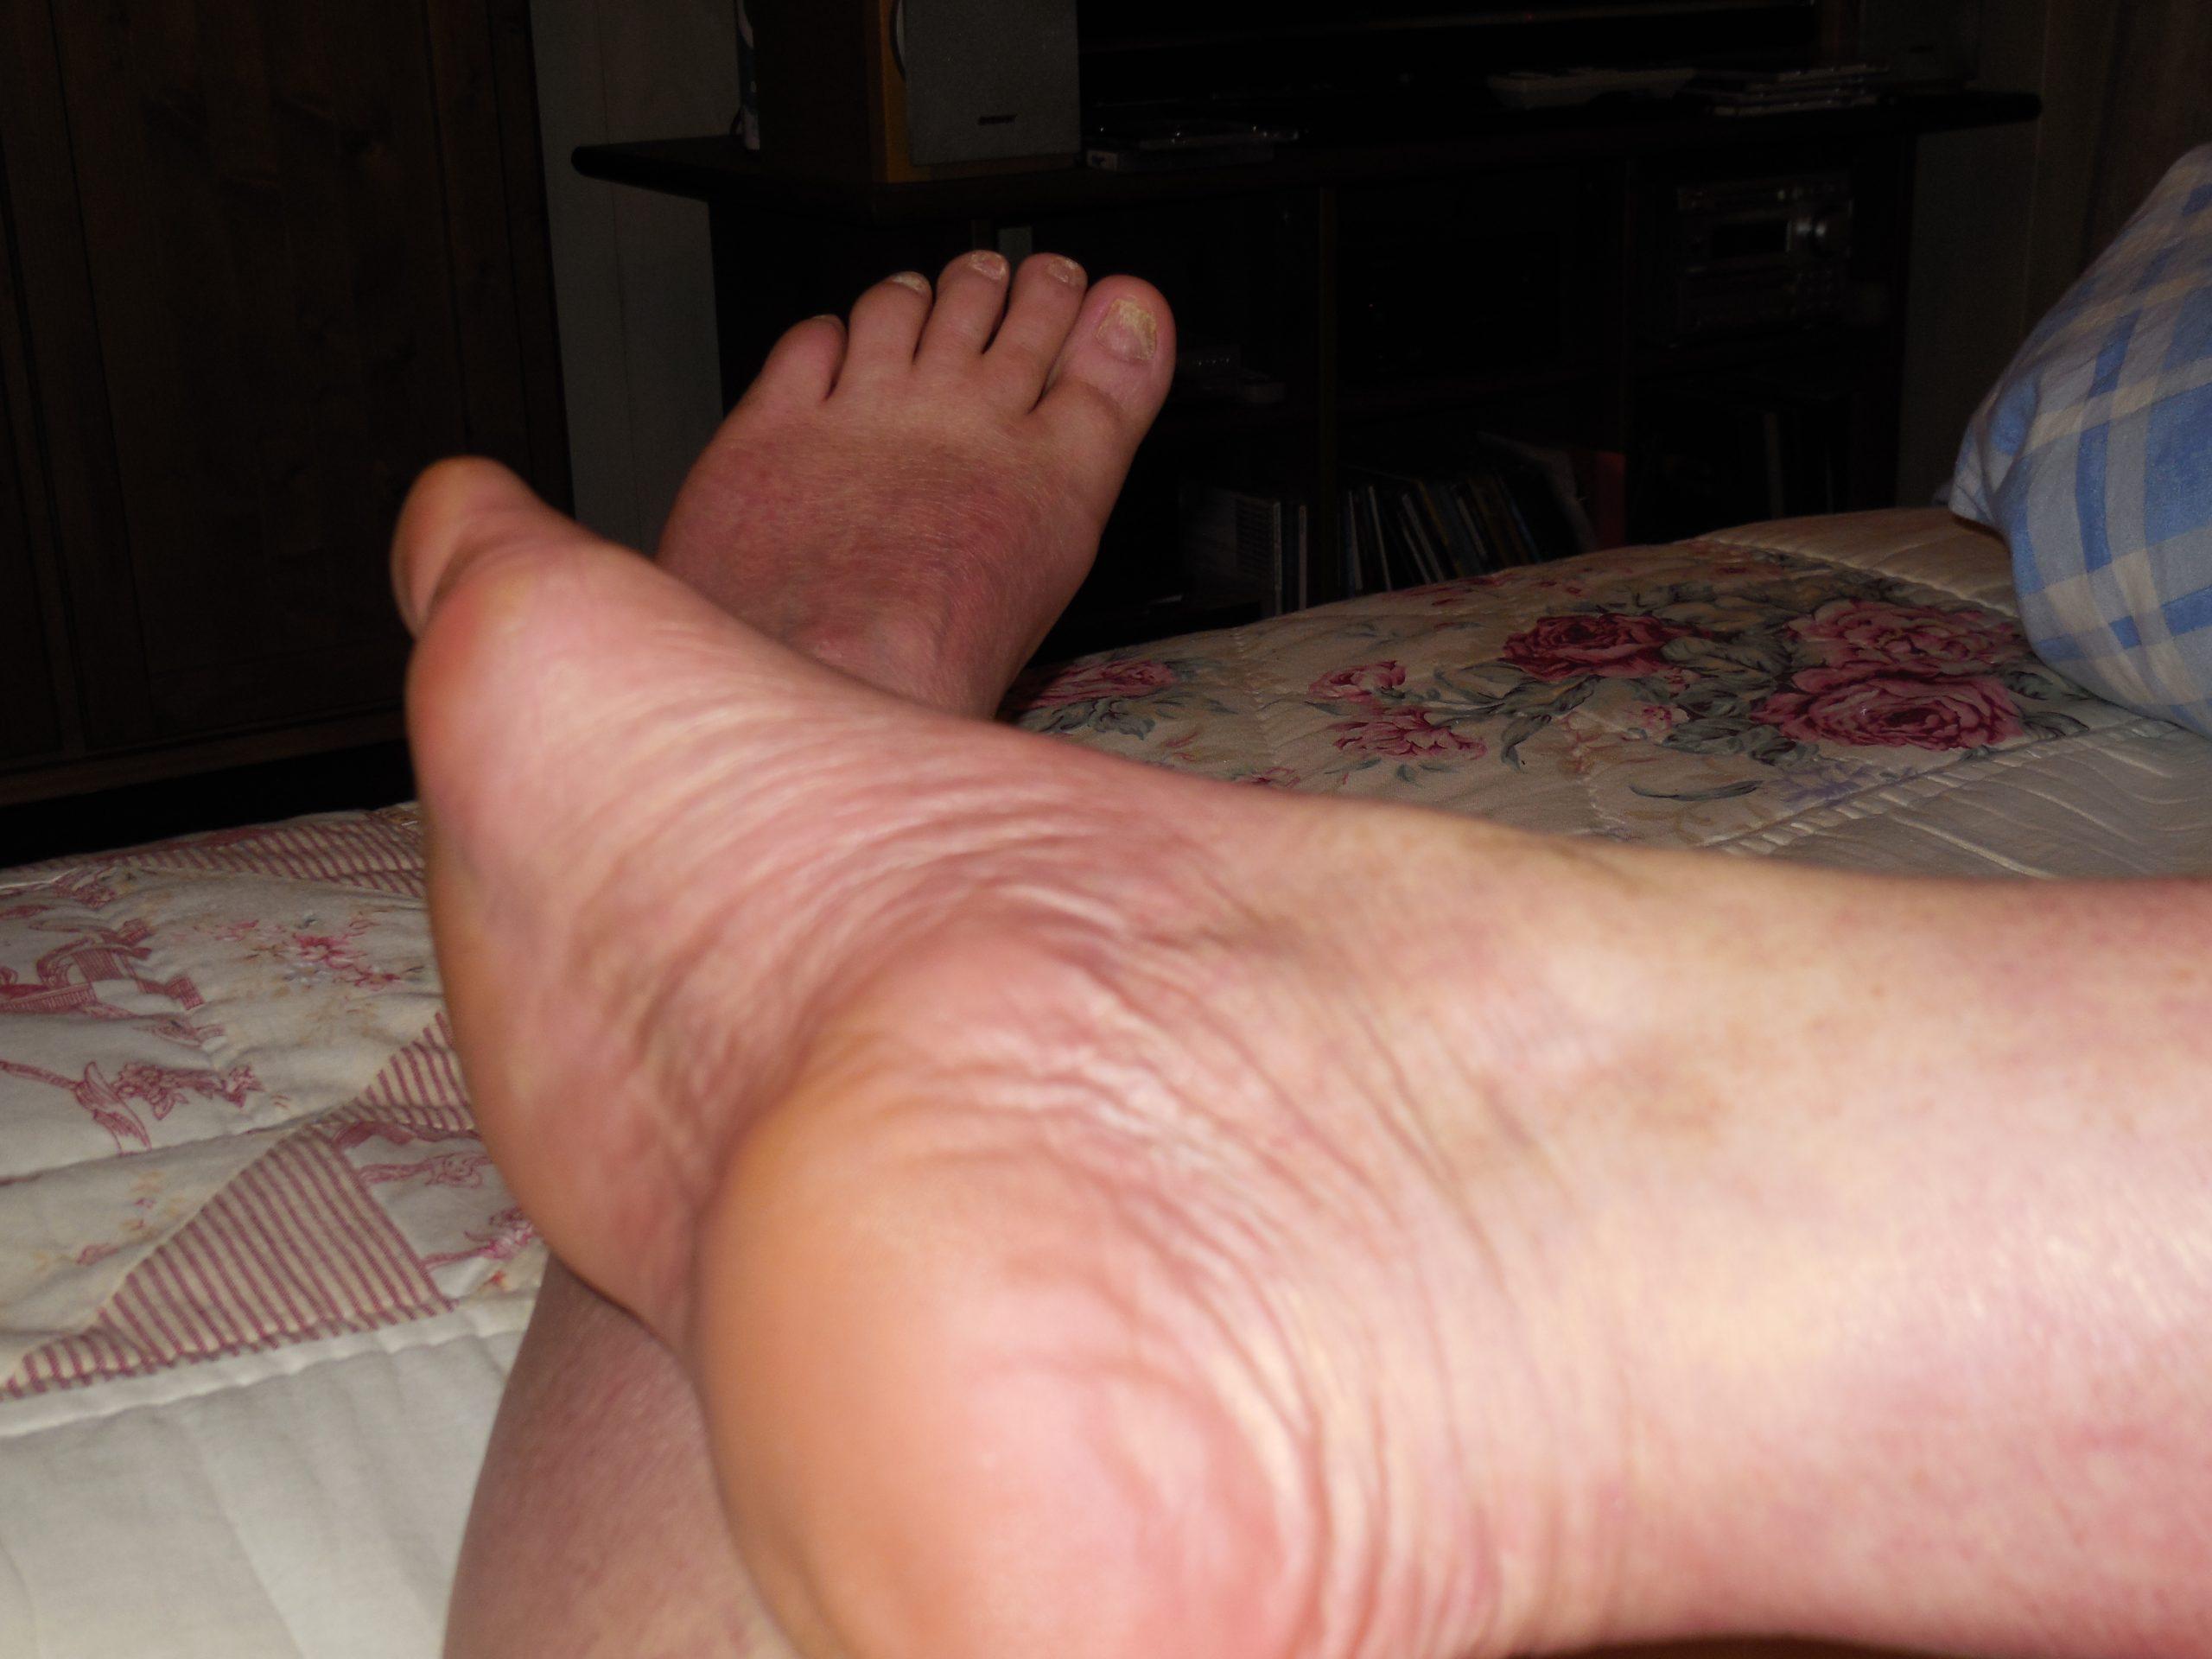 Image of Healed skin after Psoriasis